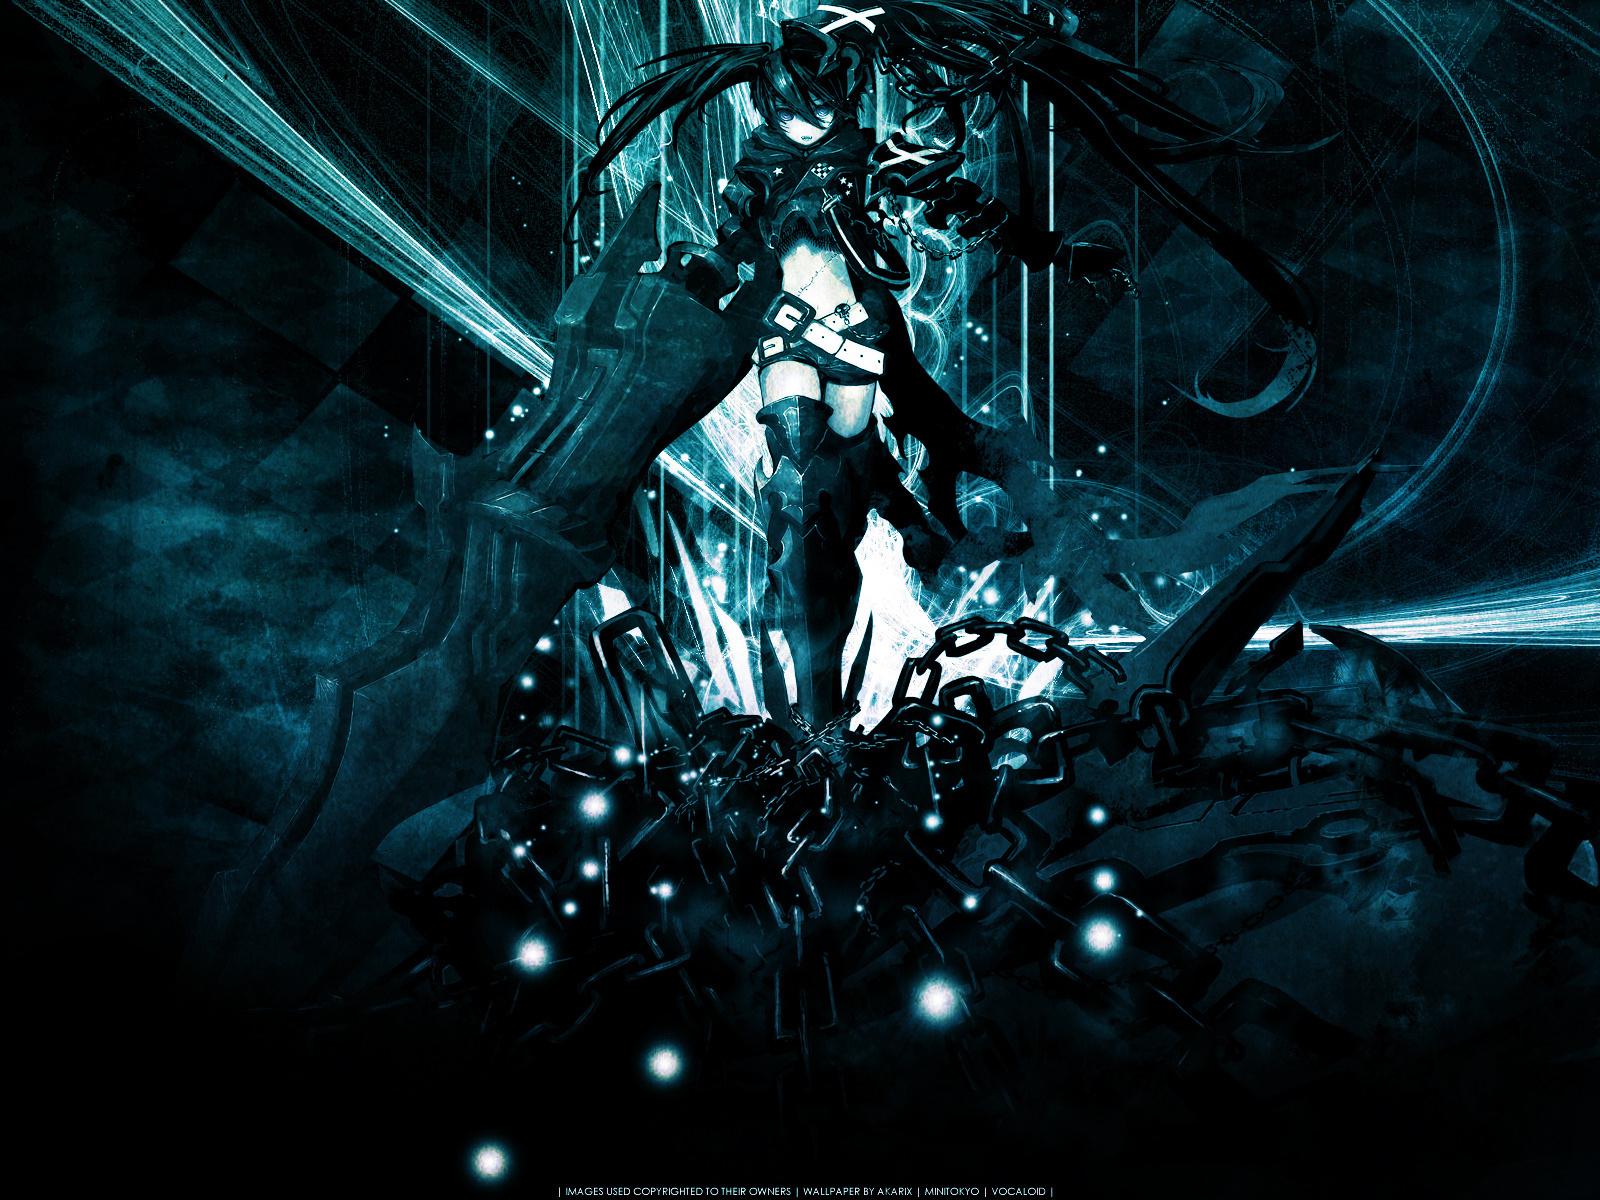 hd wallpapers cool dark anime hd wallpaper